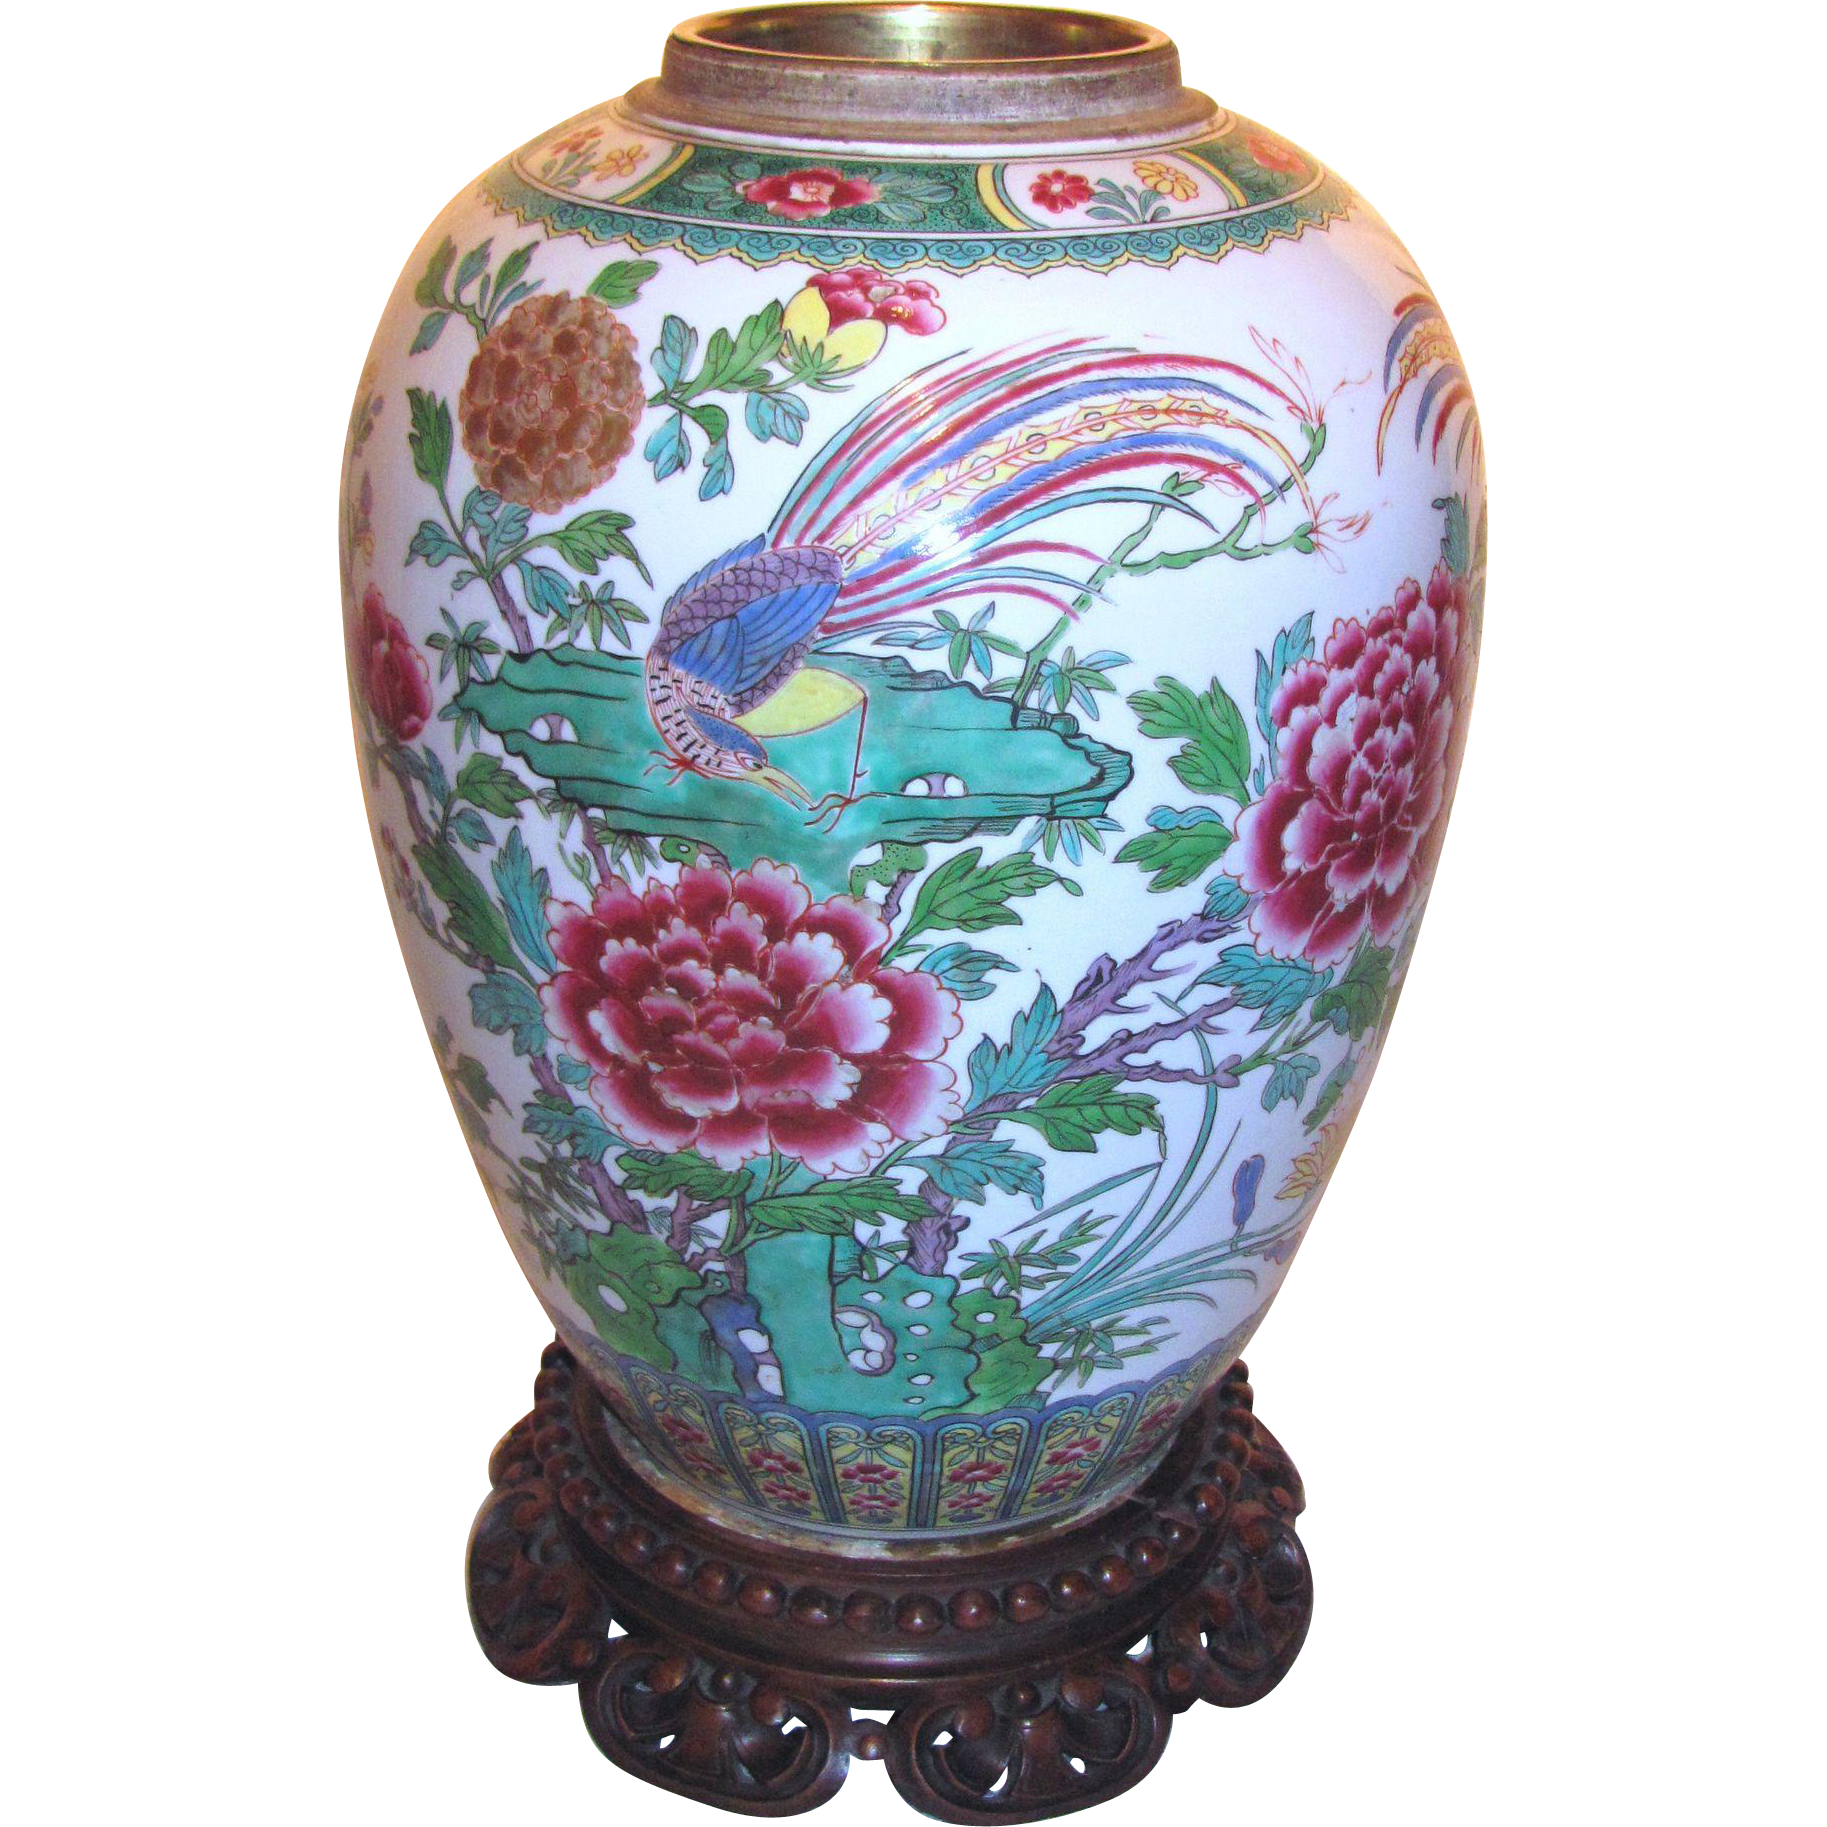 Large Antique Chinese Famille Rose Vase 19th Century